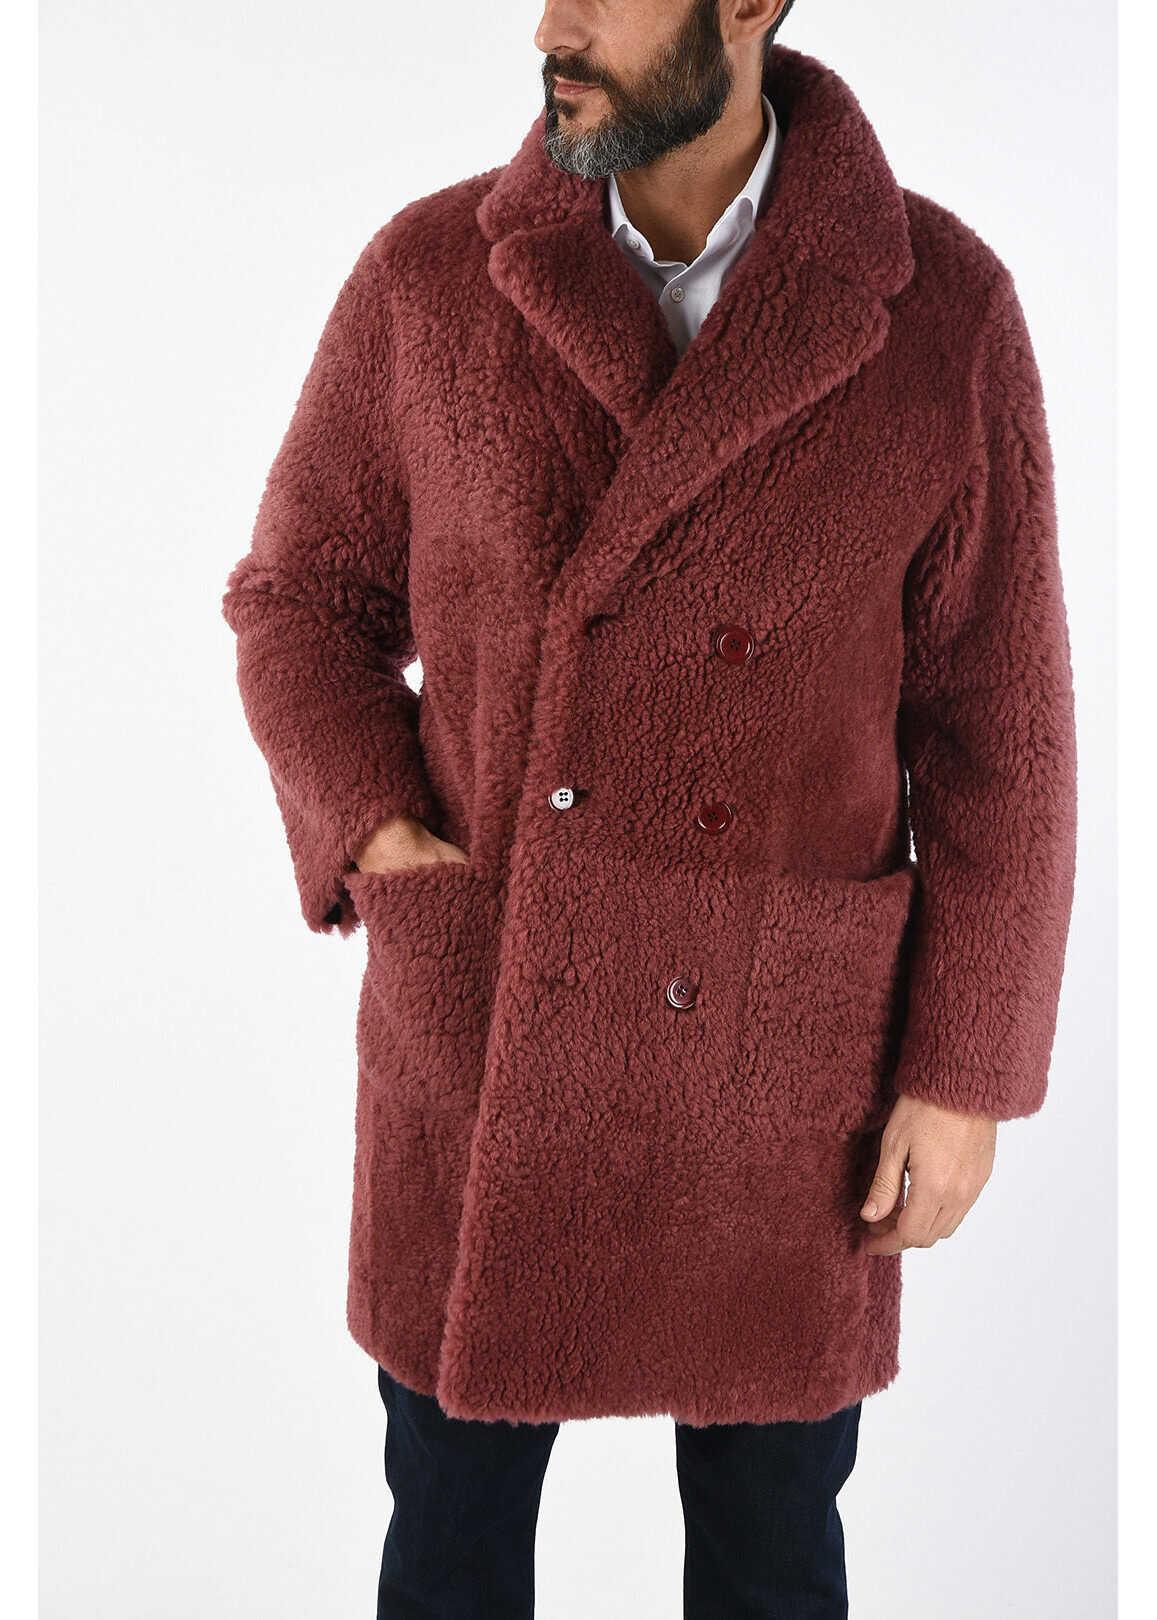 CORNELIANI CC COLLECTION shearling ISLANDA coat PINK imagine